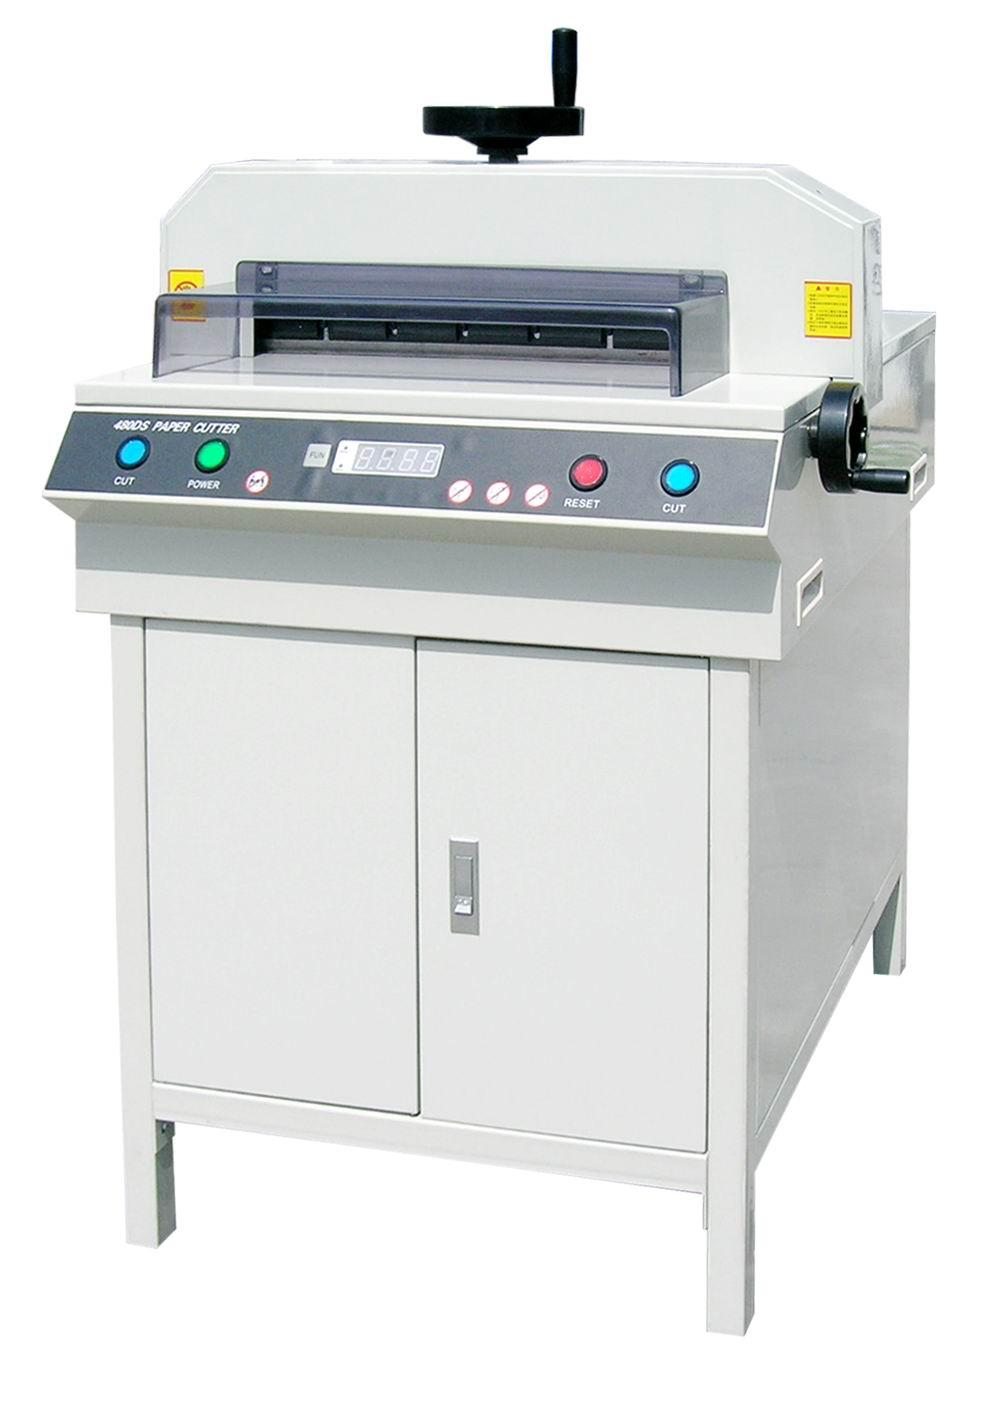 Bulros 480DFS